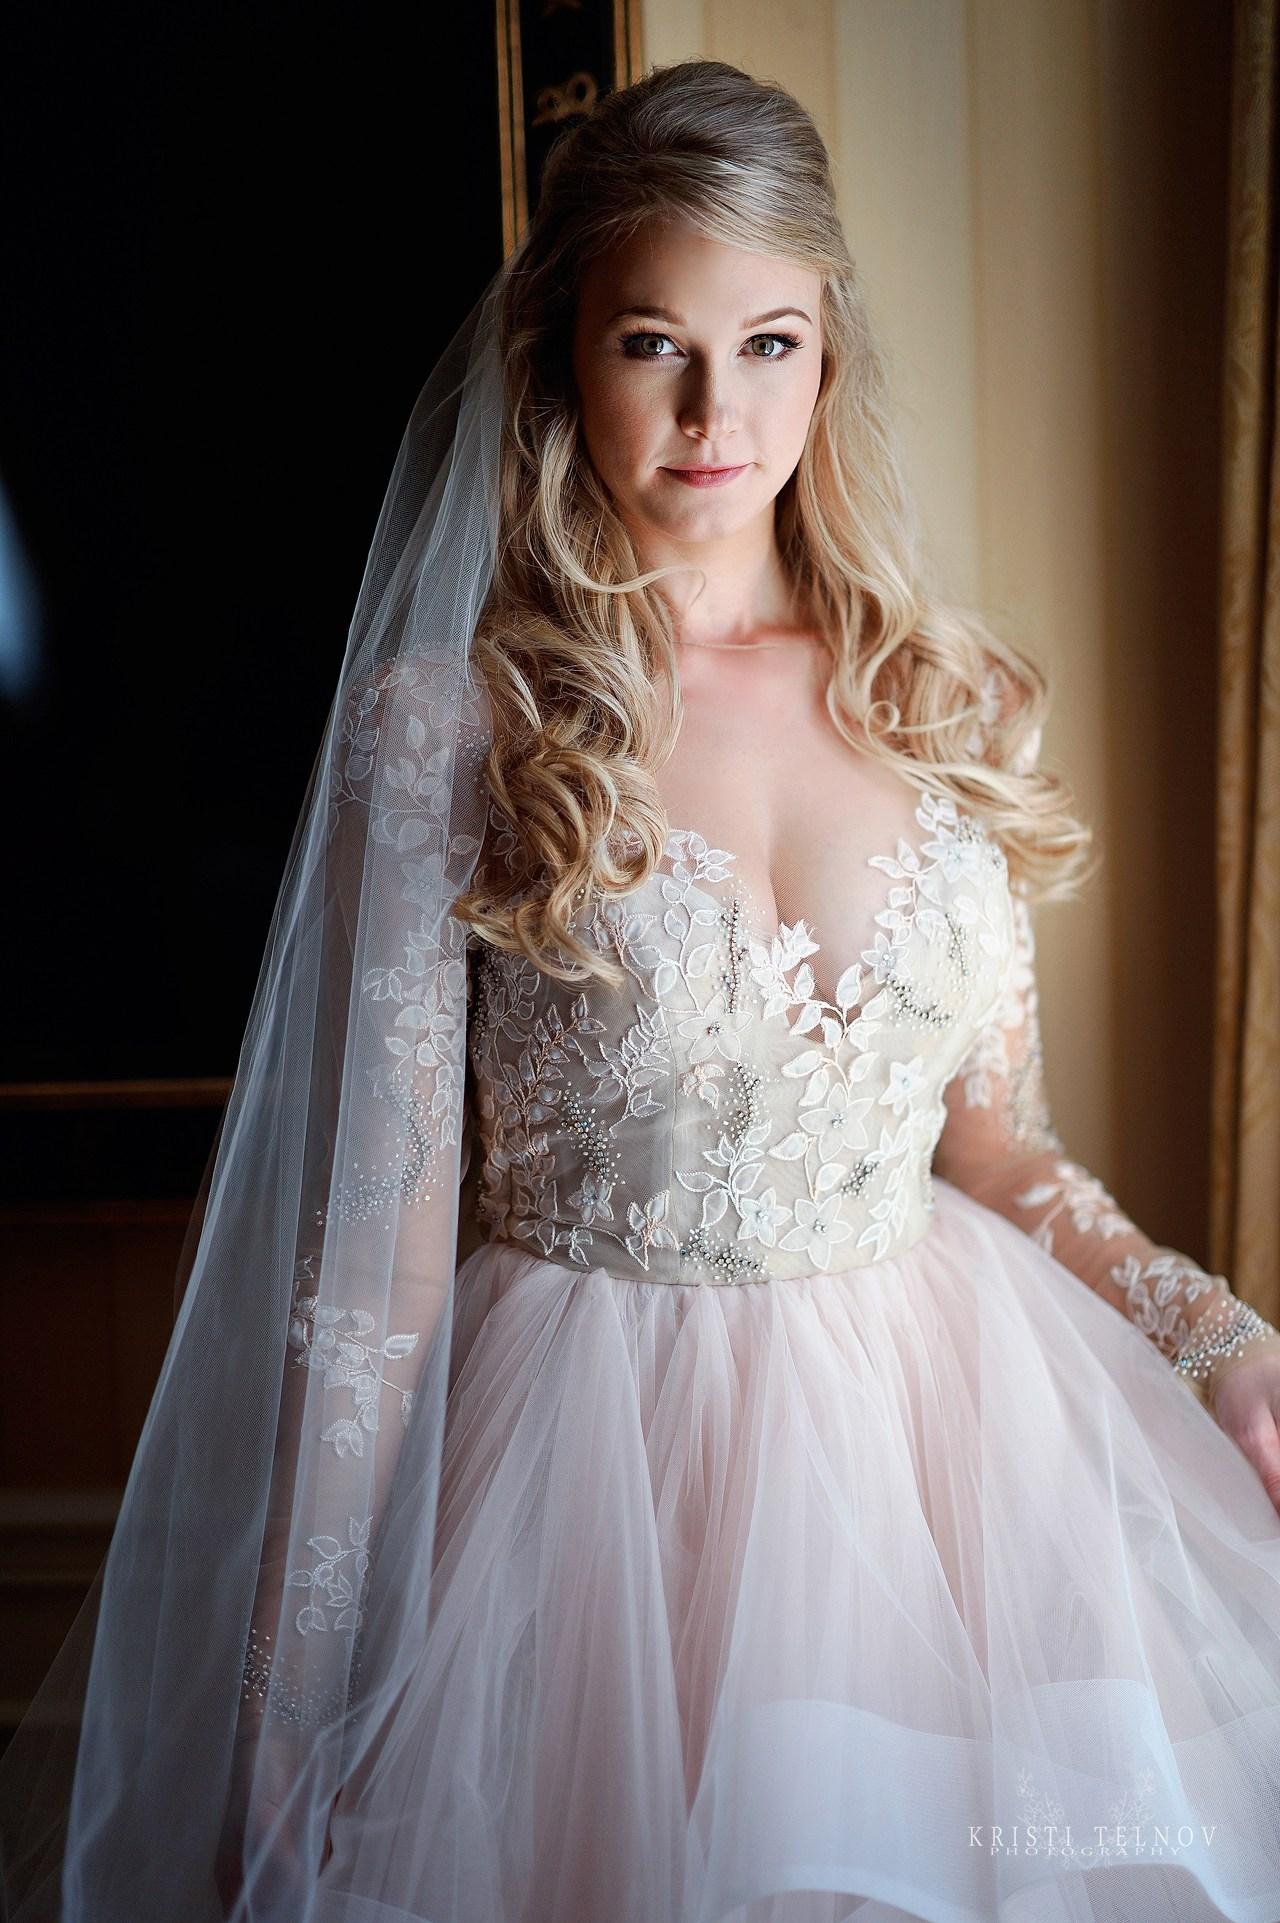 Piitsburgh-Wedding-Photo029-1.jpg